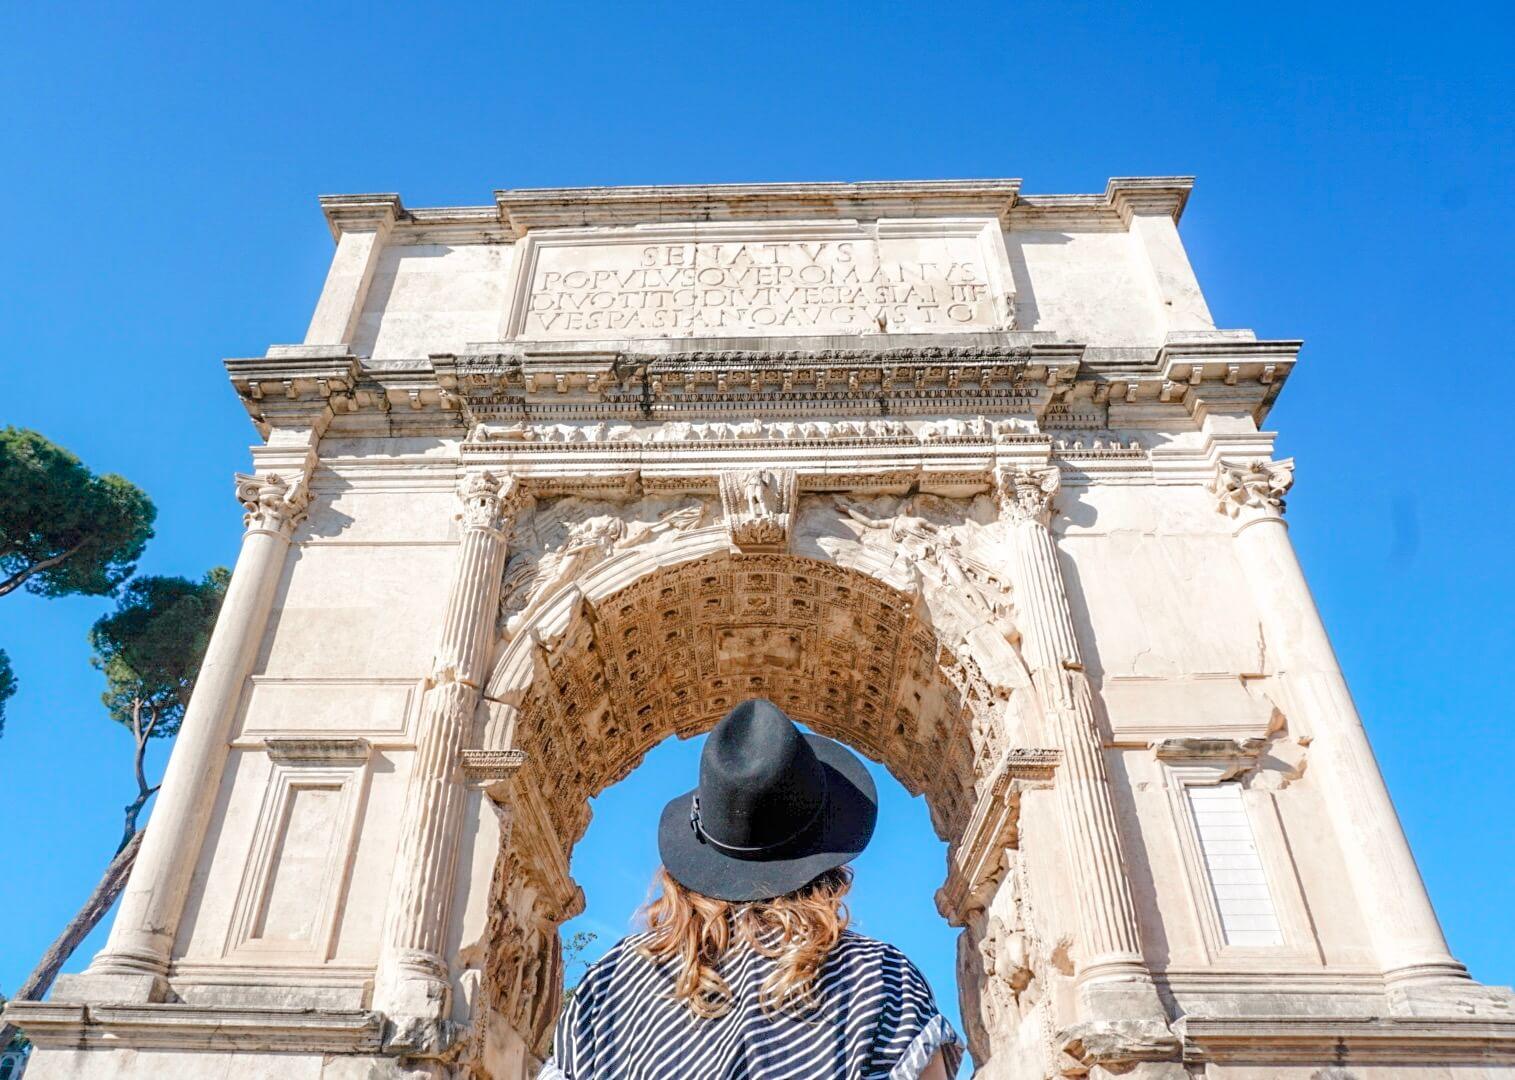 visiter forum et palatin rome conseils